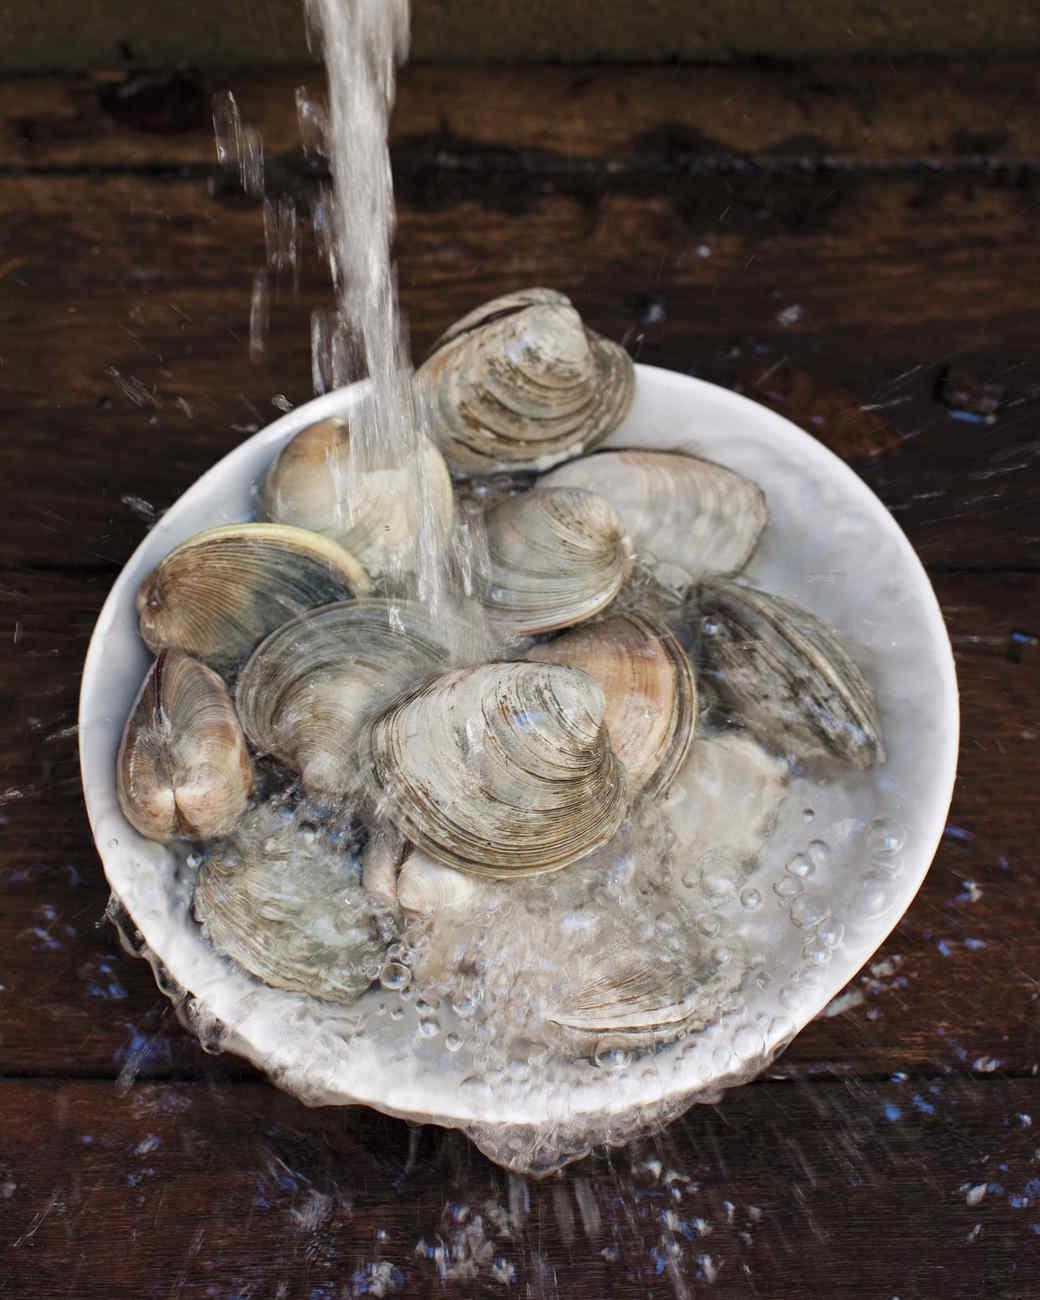 clams-1-mld107734.jpg